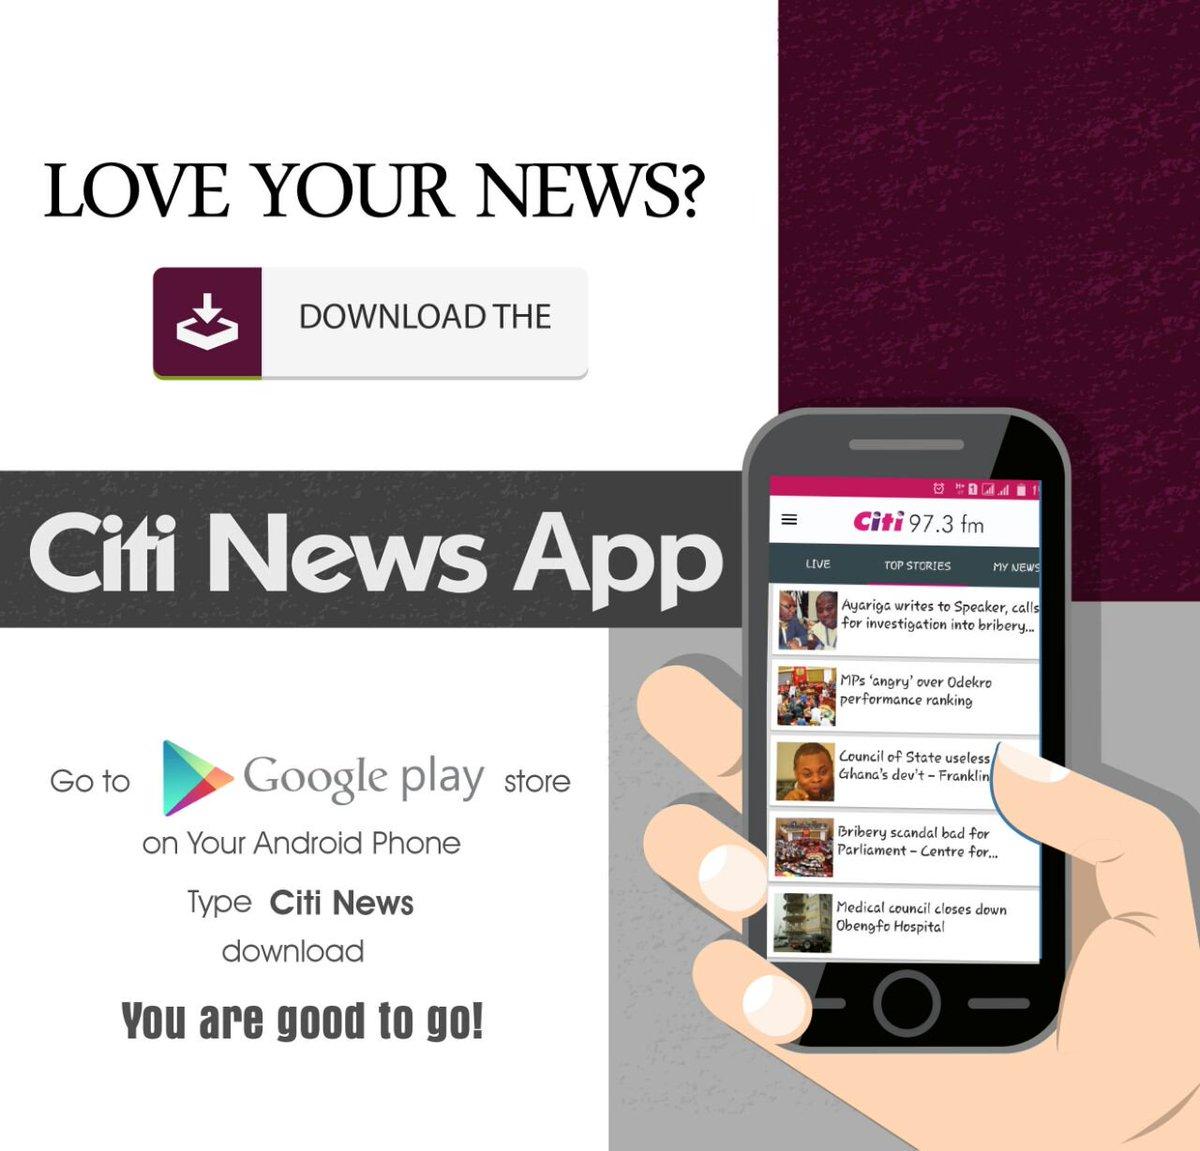 CitiNewsroom on Twitter: